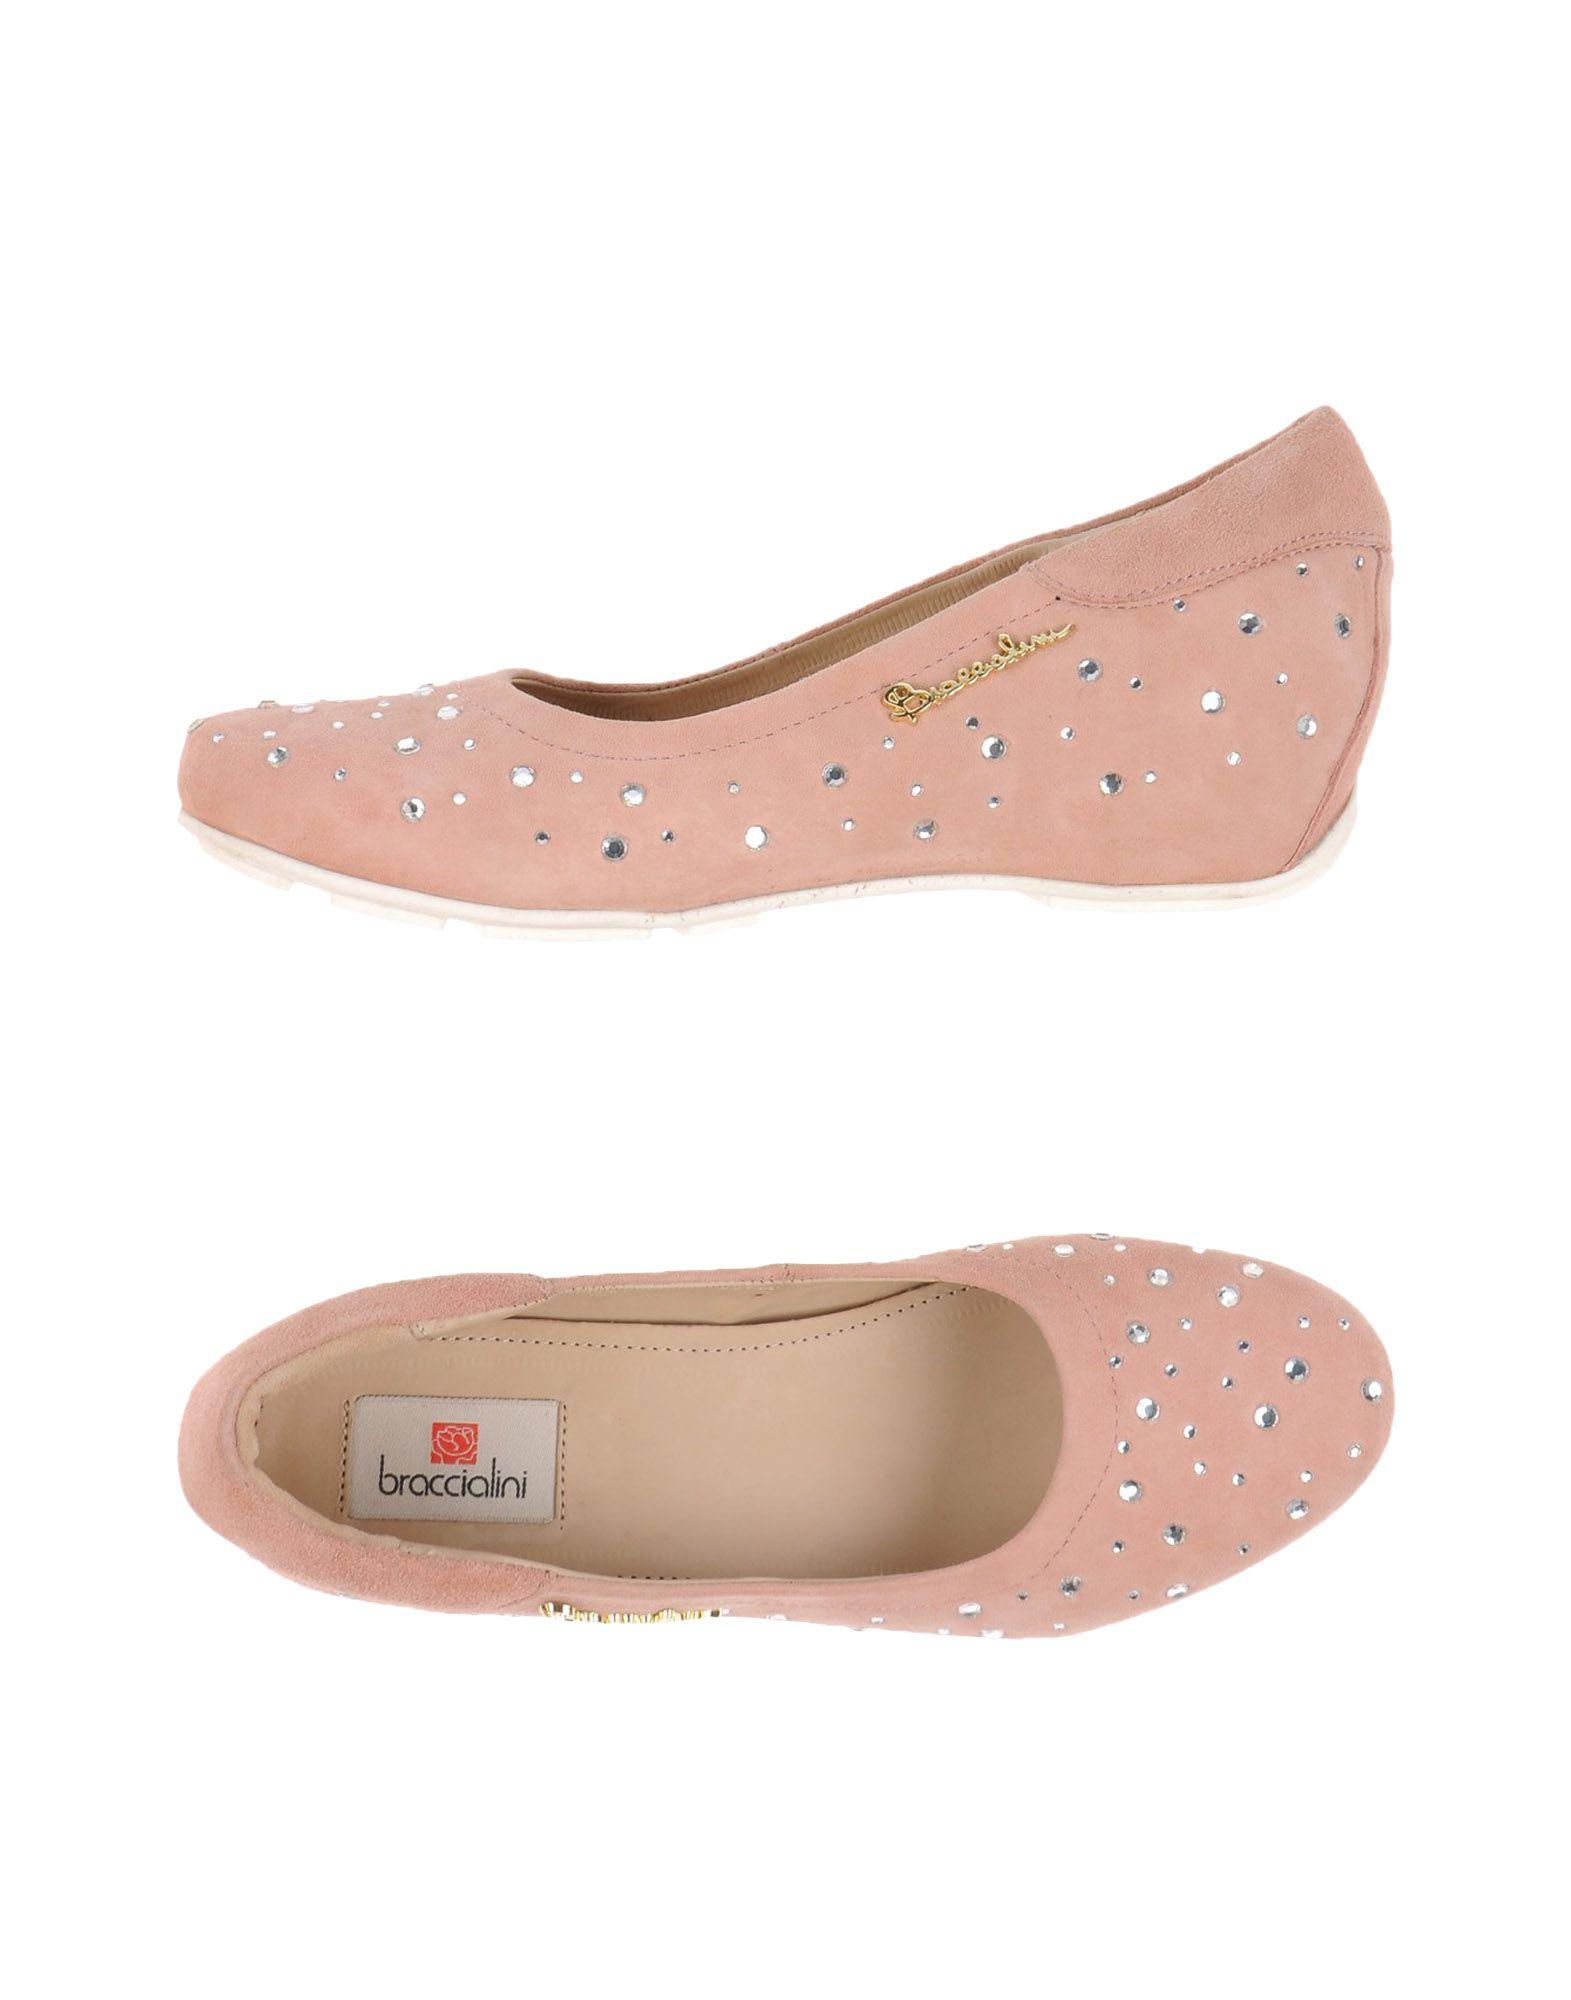 Braccialini Pumps Damen  11197107HB Gute Qualität beliebte Schuhe